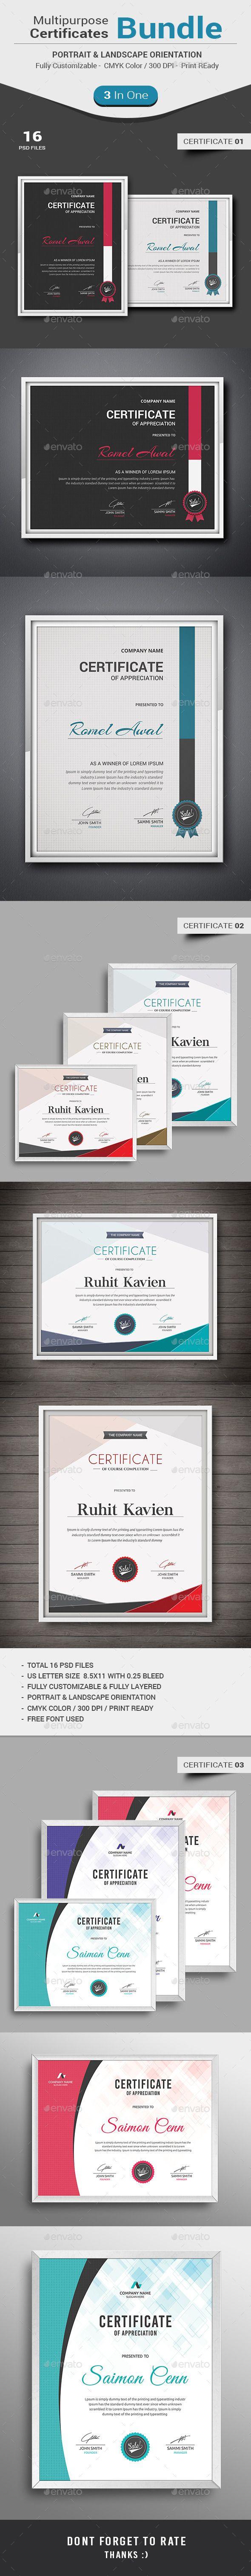 Multipurpose Certificates Template PSD Bundle. Download here: http://graphicriver.net/item/multipurpose-certificates-bundle-/13183388?ref=ksioks